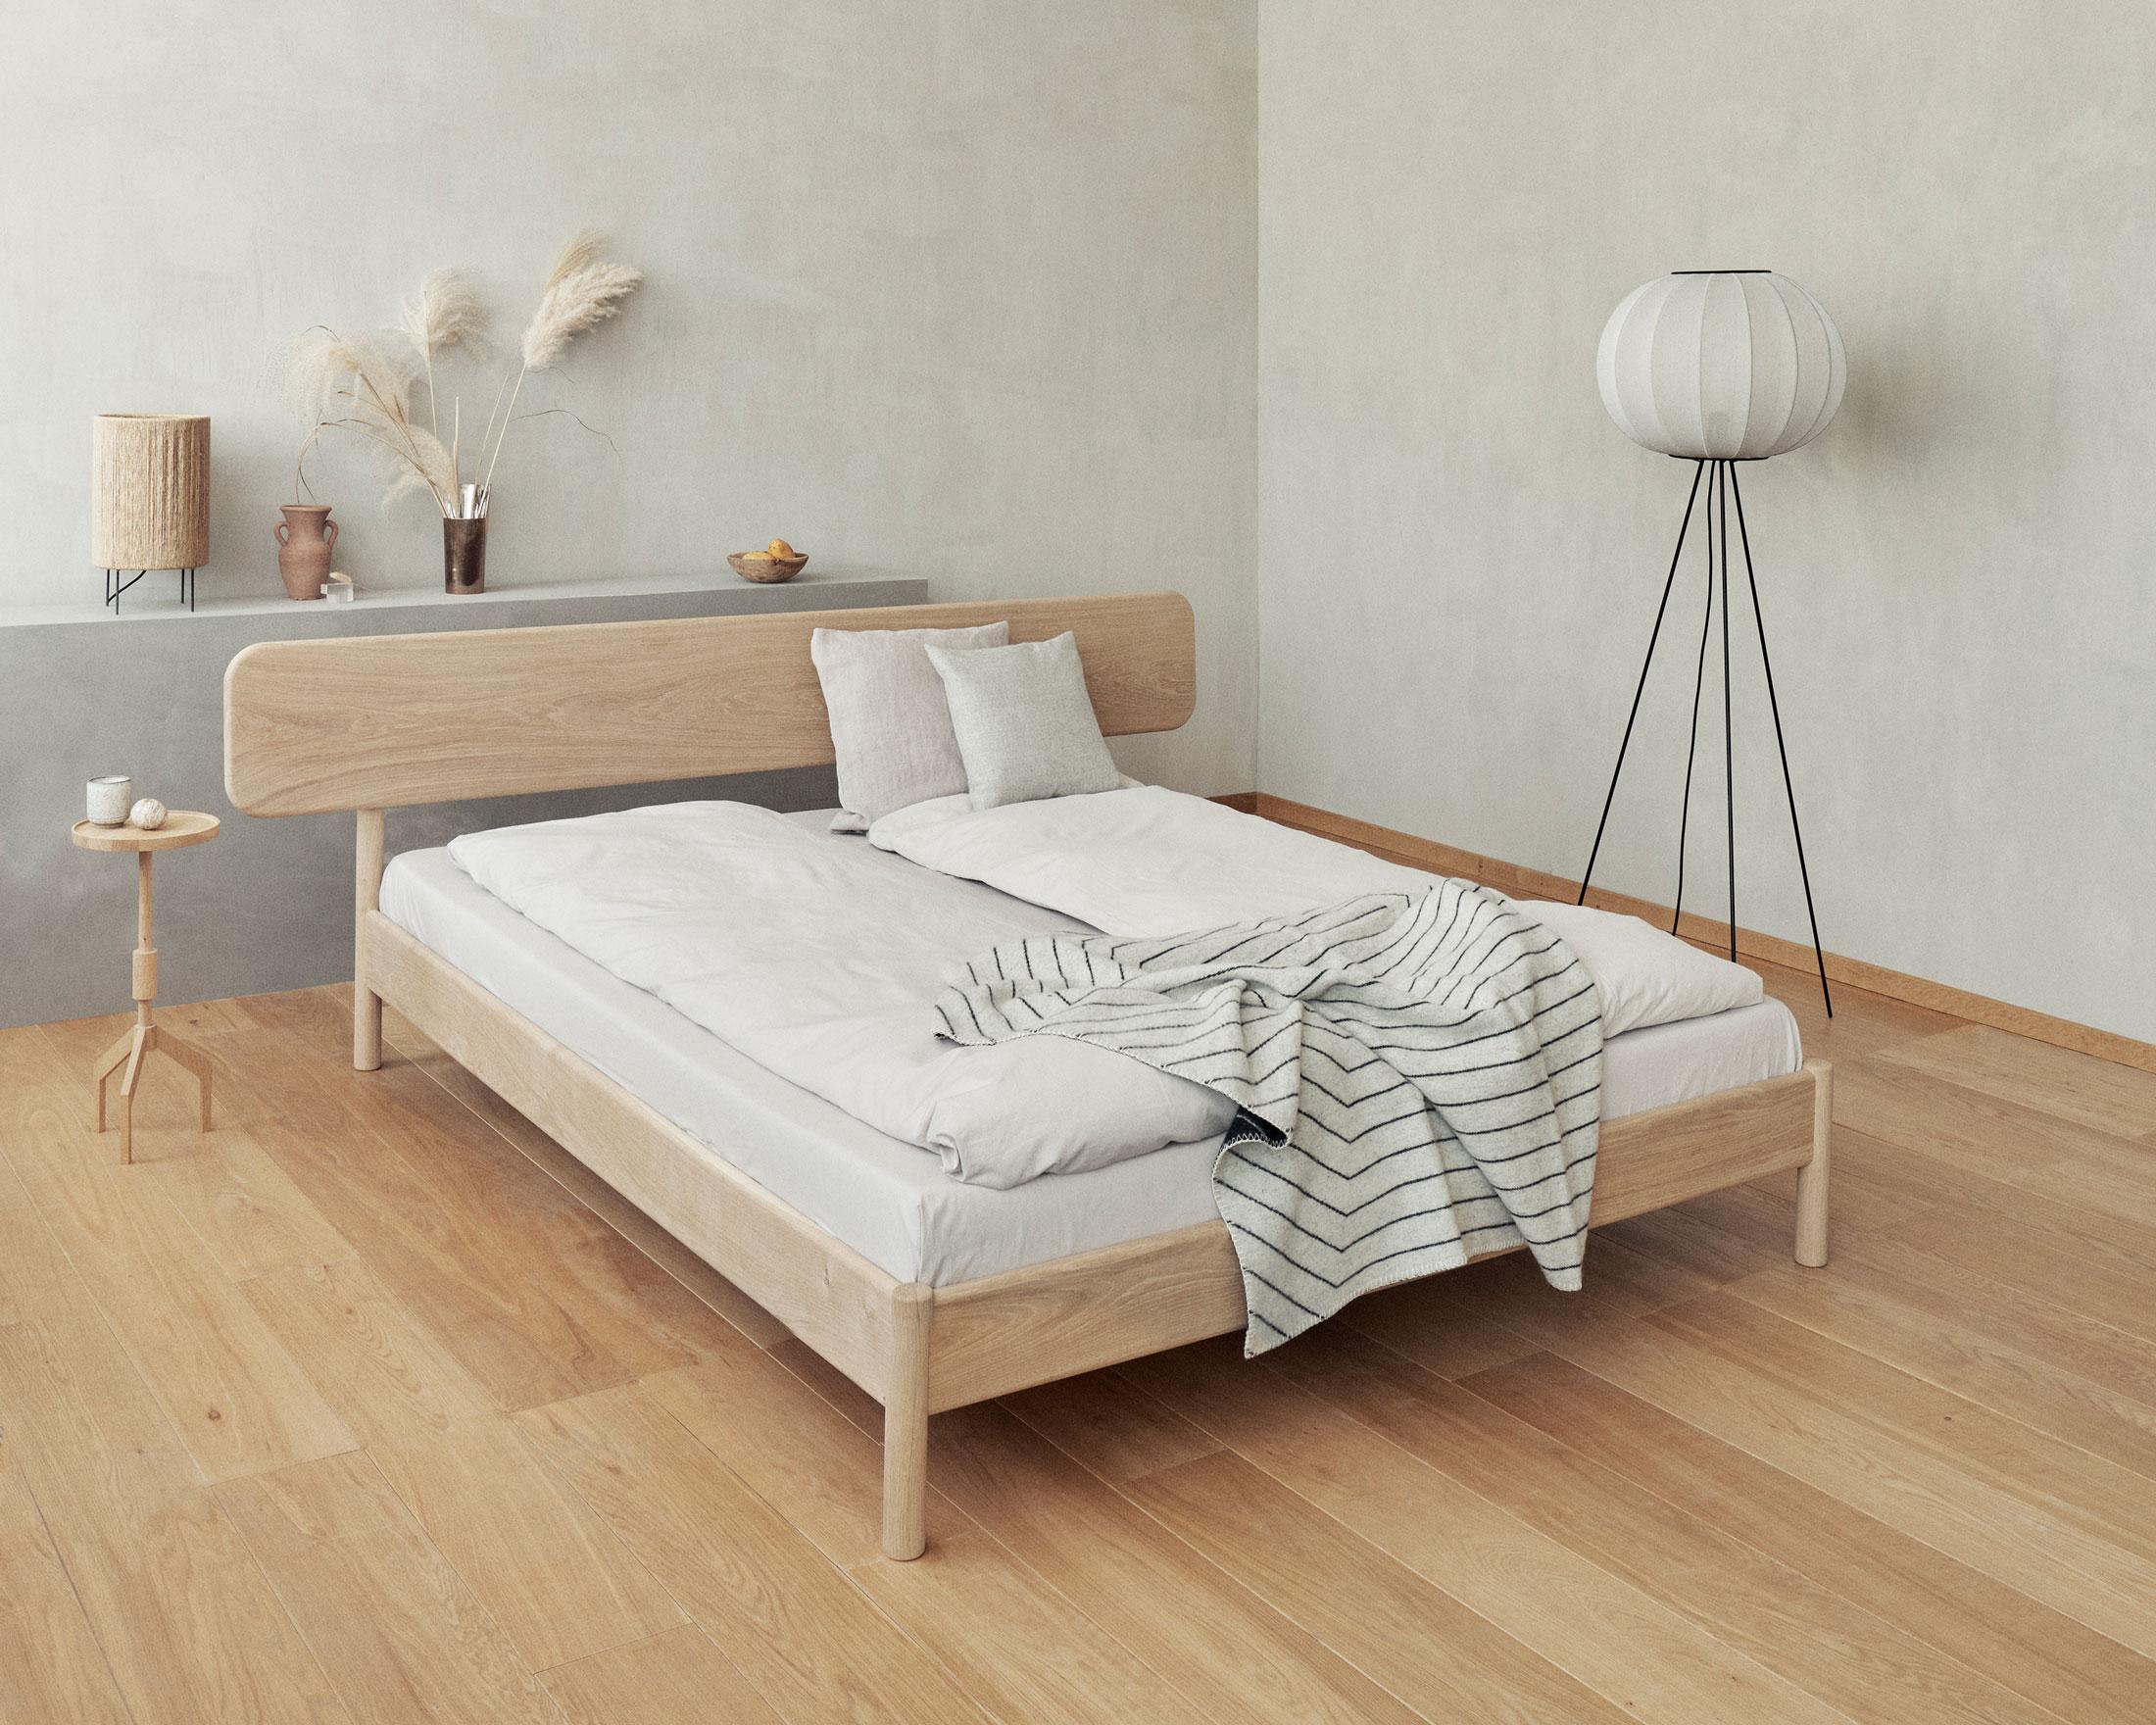 022-ALKEN-BED-AT-THE-LAB-RE-BEDS-DESIGN-BY-OLIVER-&-LUKAS-WEISSKROGH.jpg